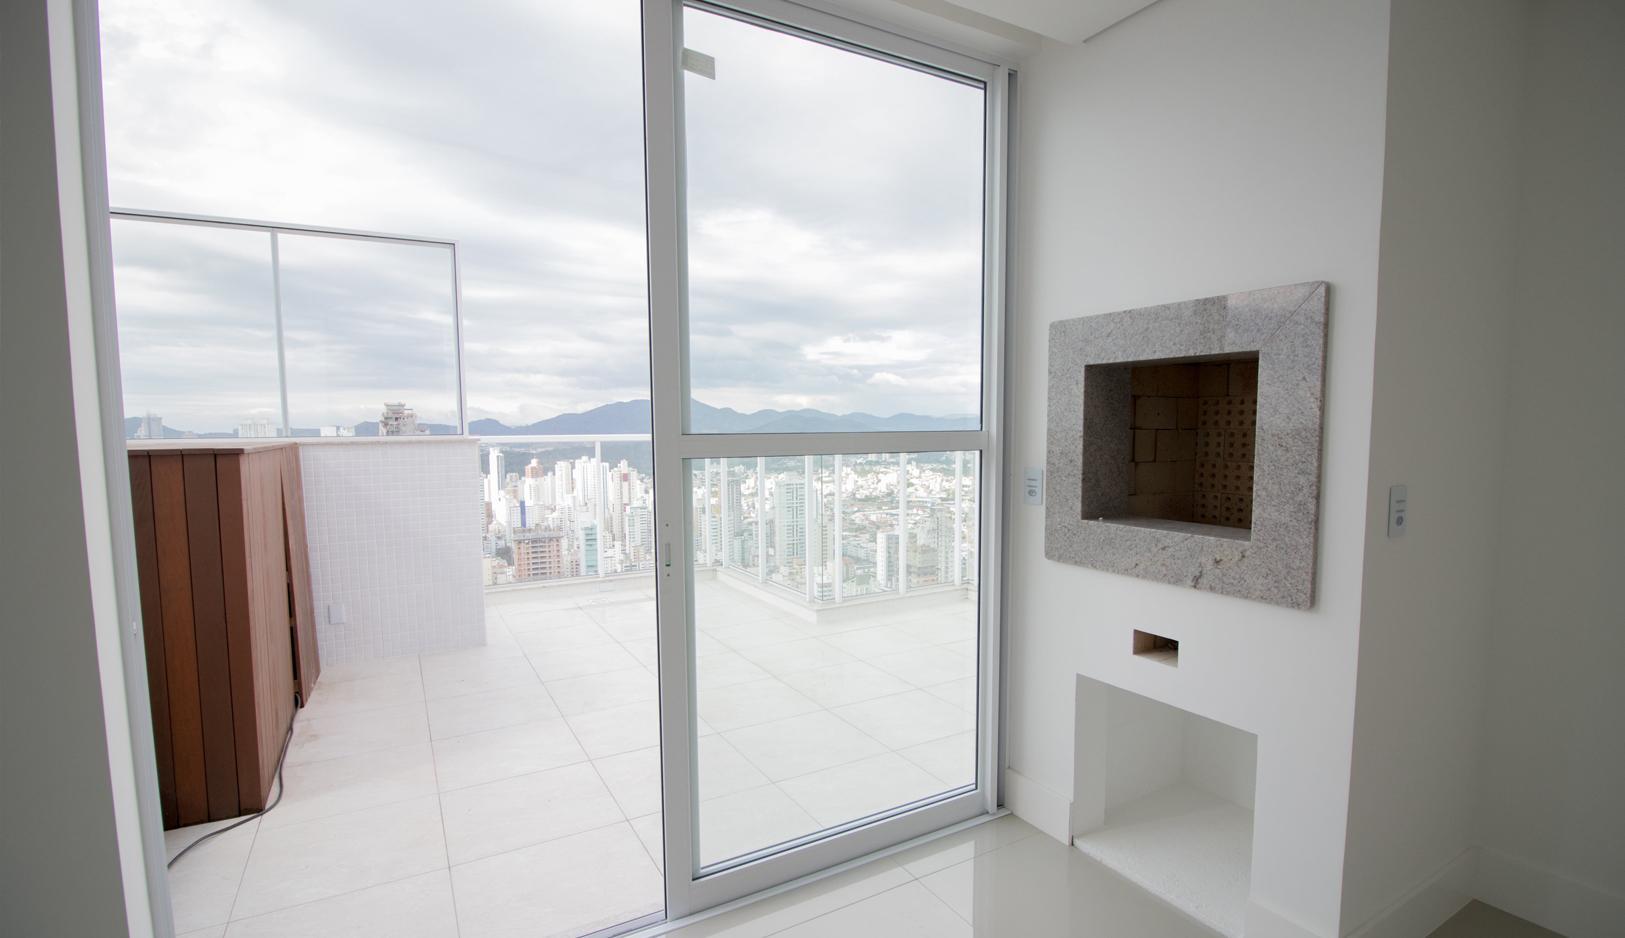 Cobertura Duplex no Illuminati em Balneário Camboriú